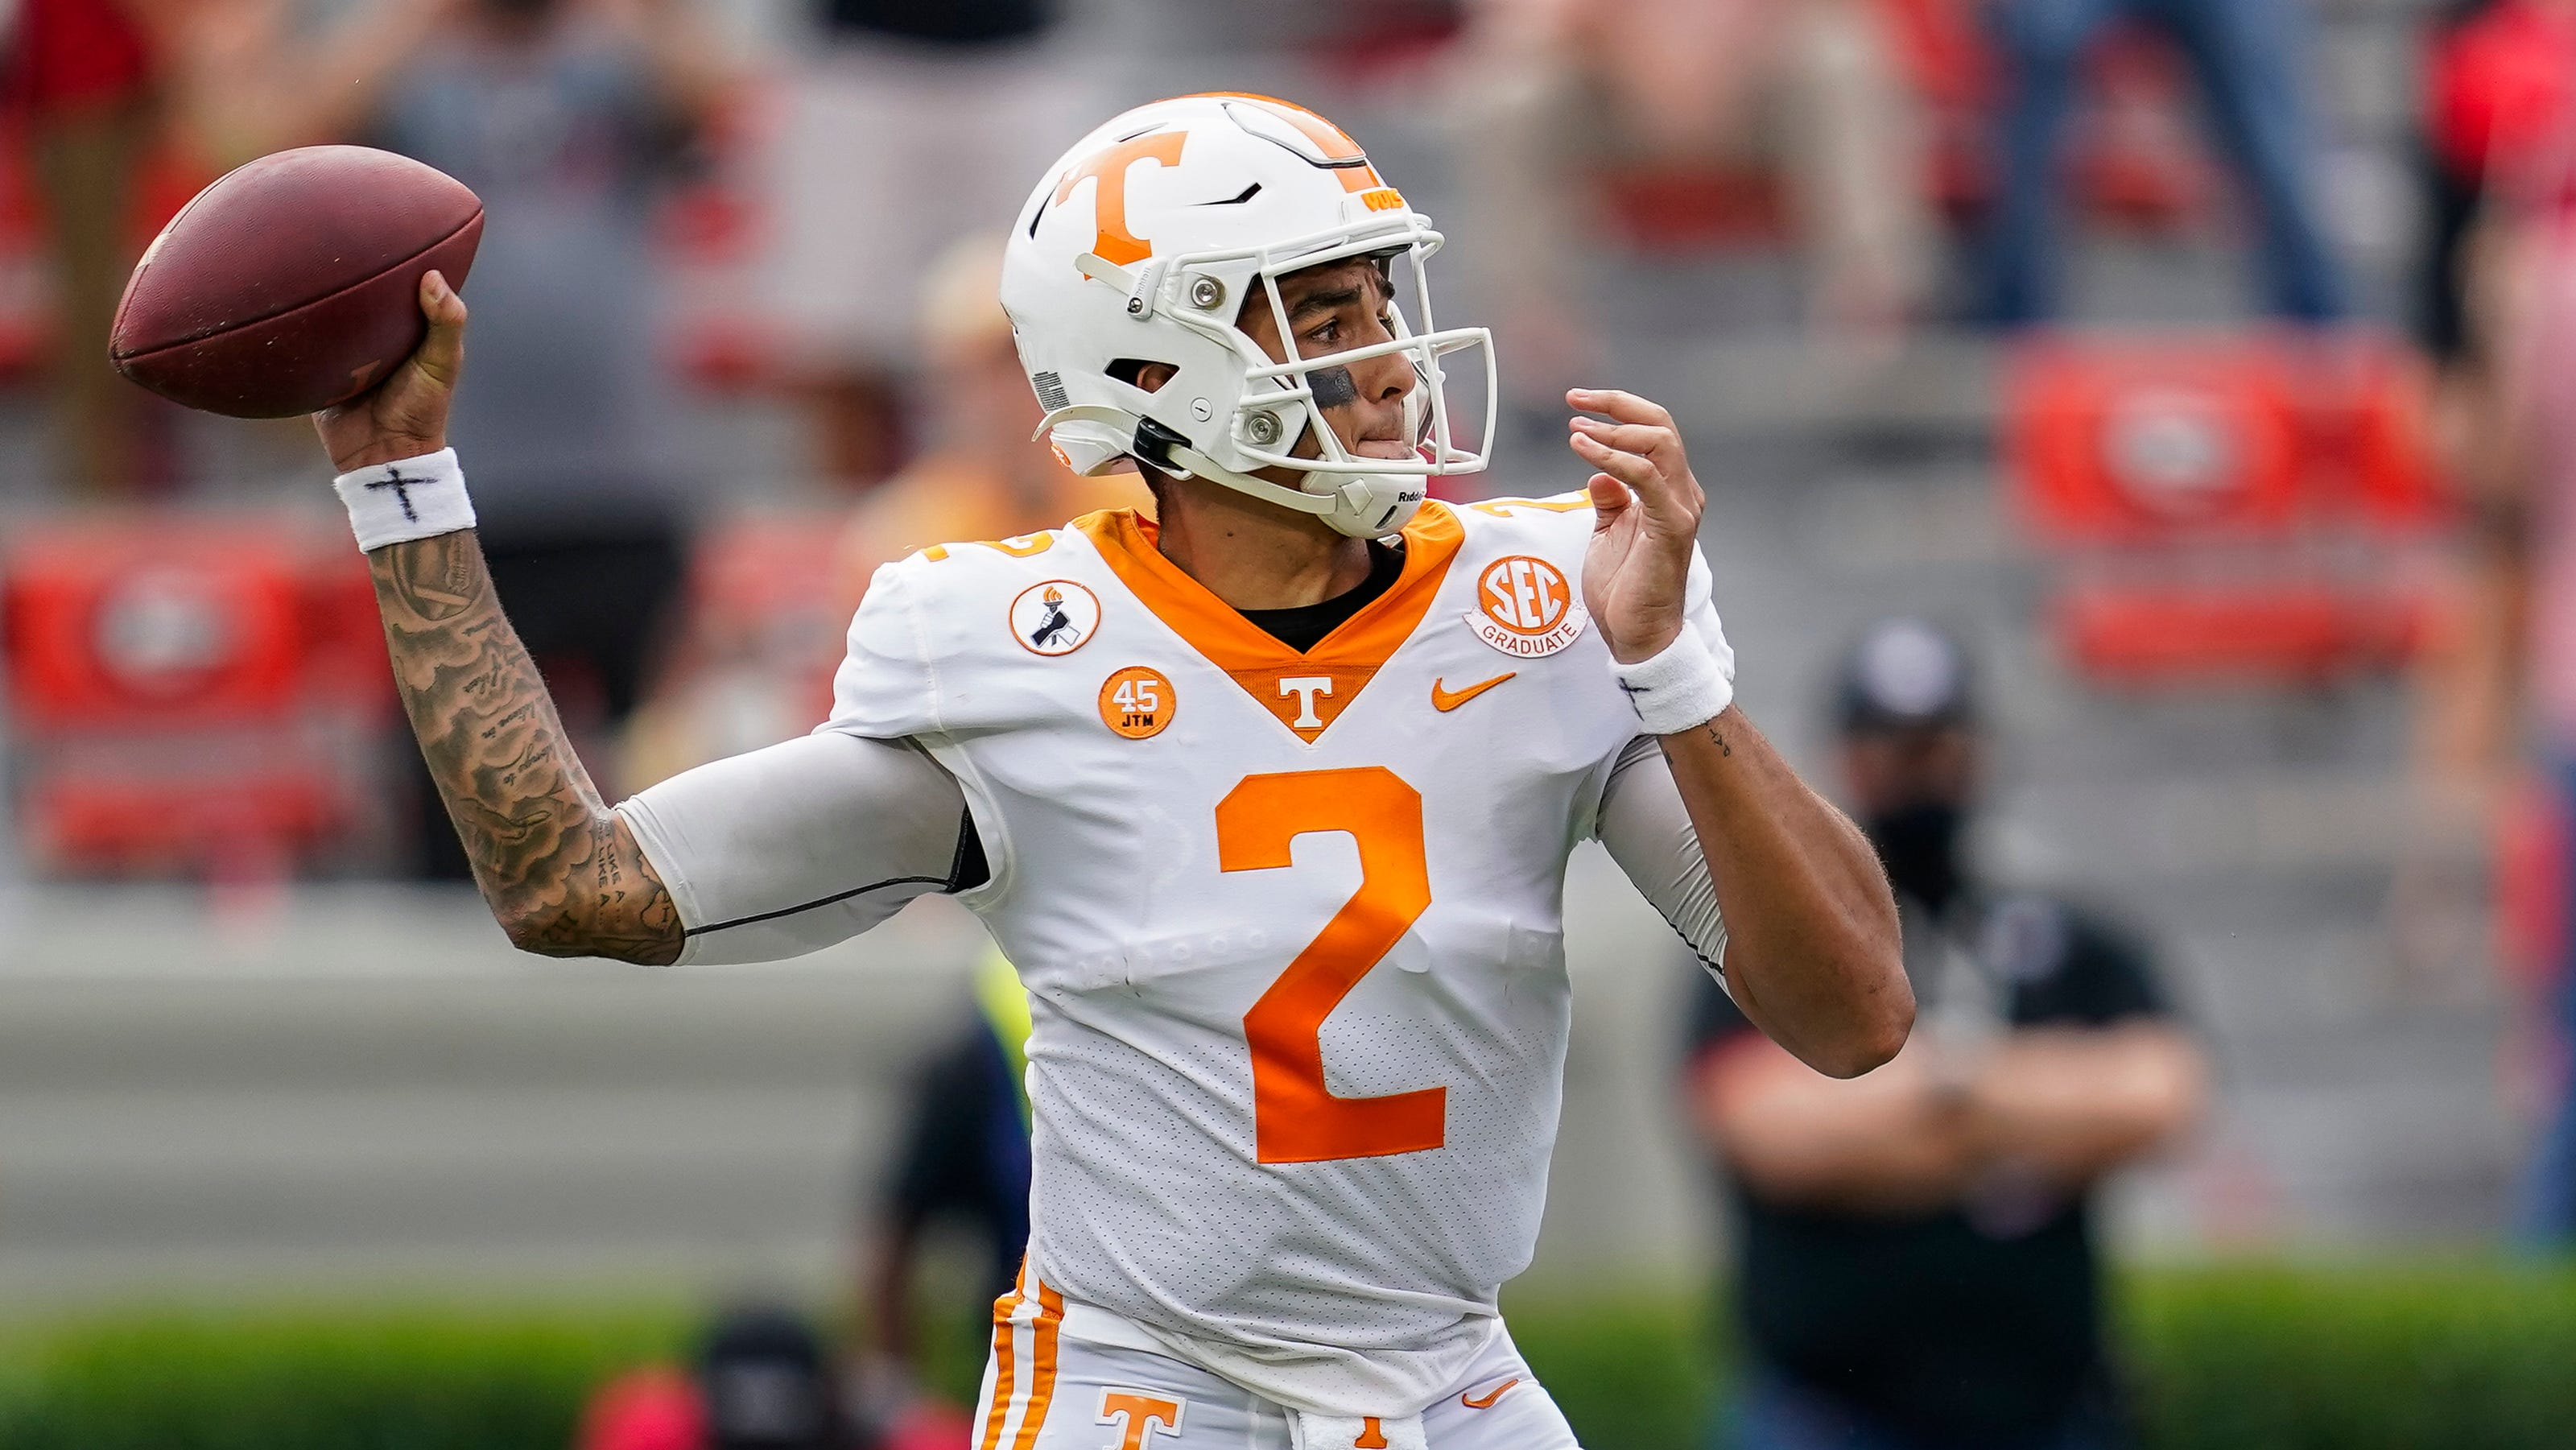 Tennessee Vols football vs Kentucky: Score, game updates